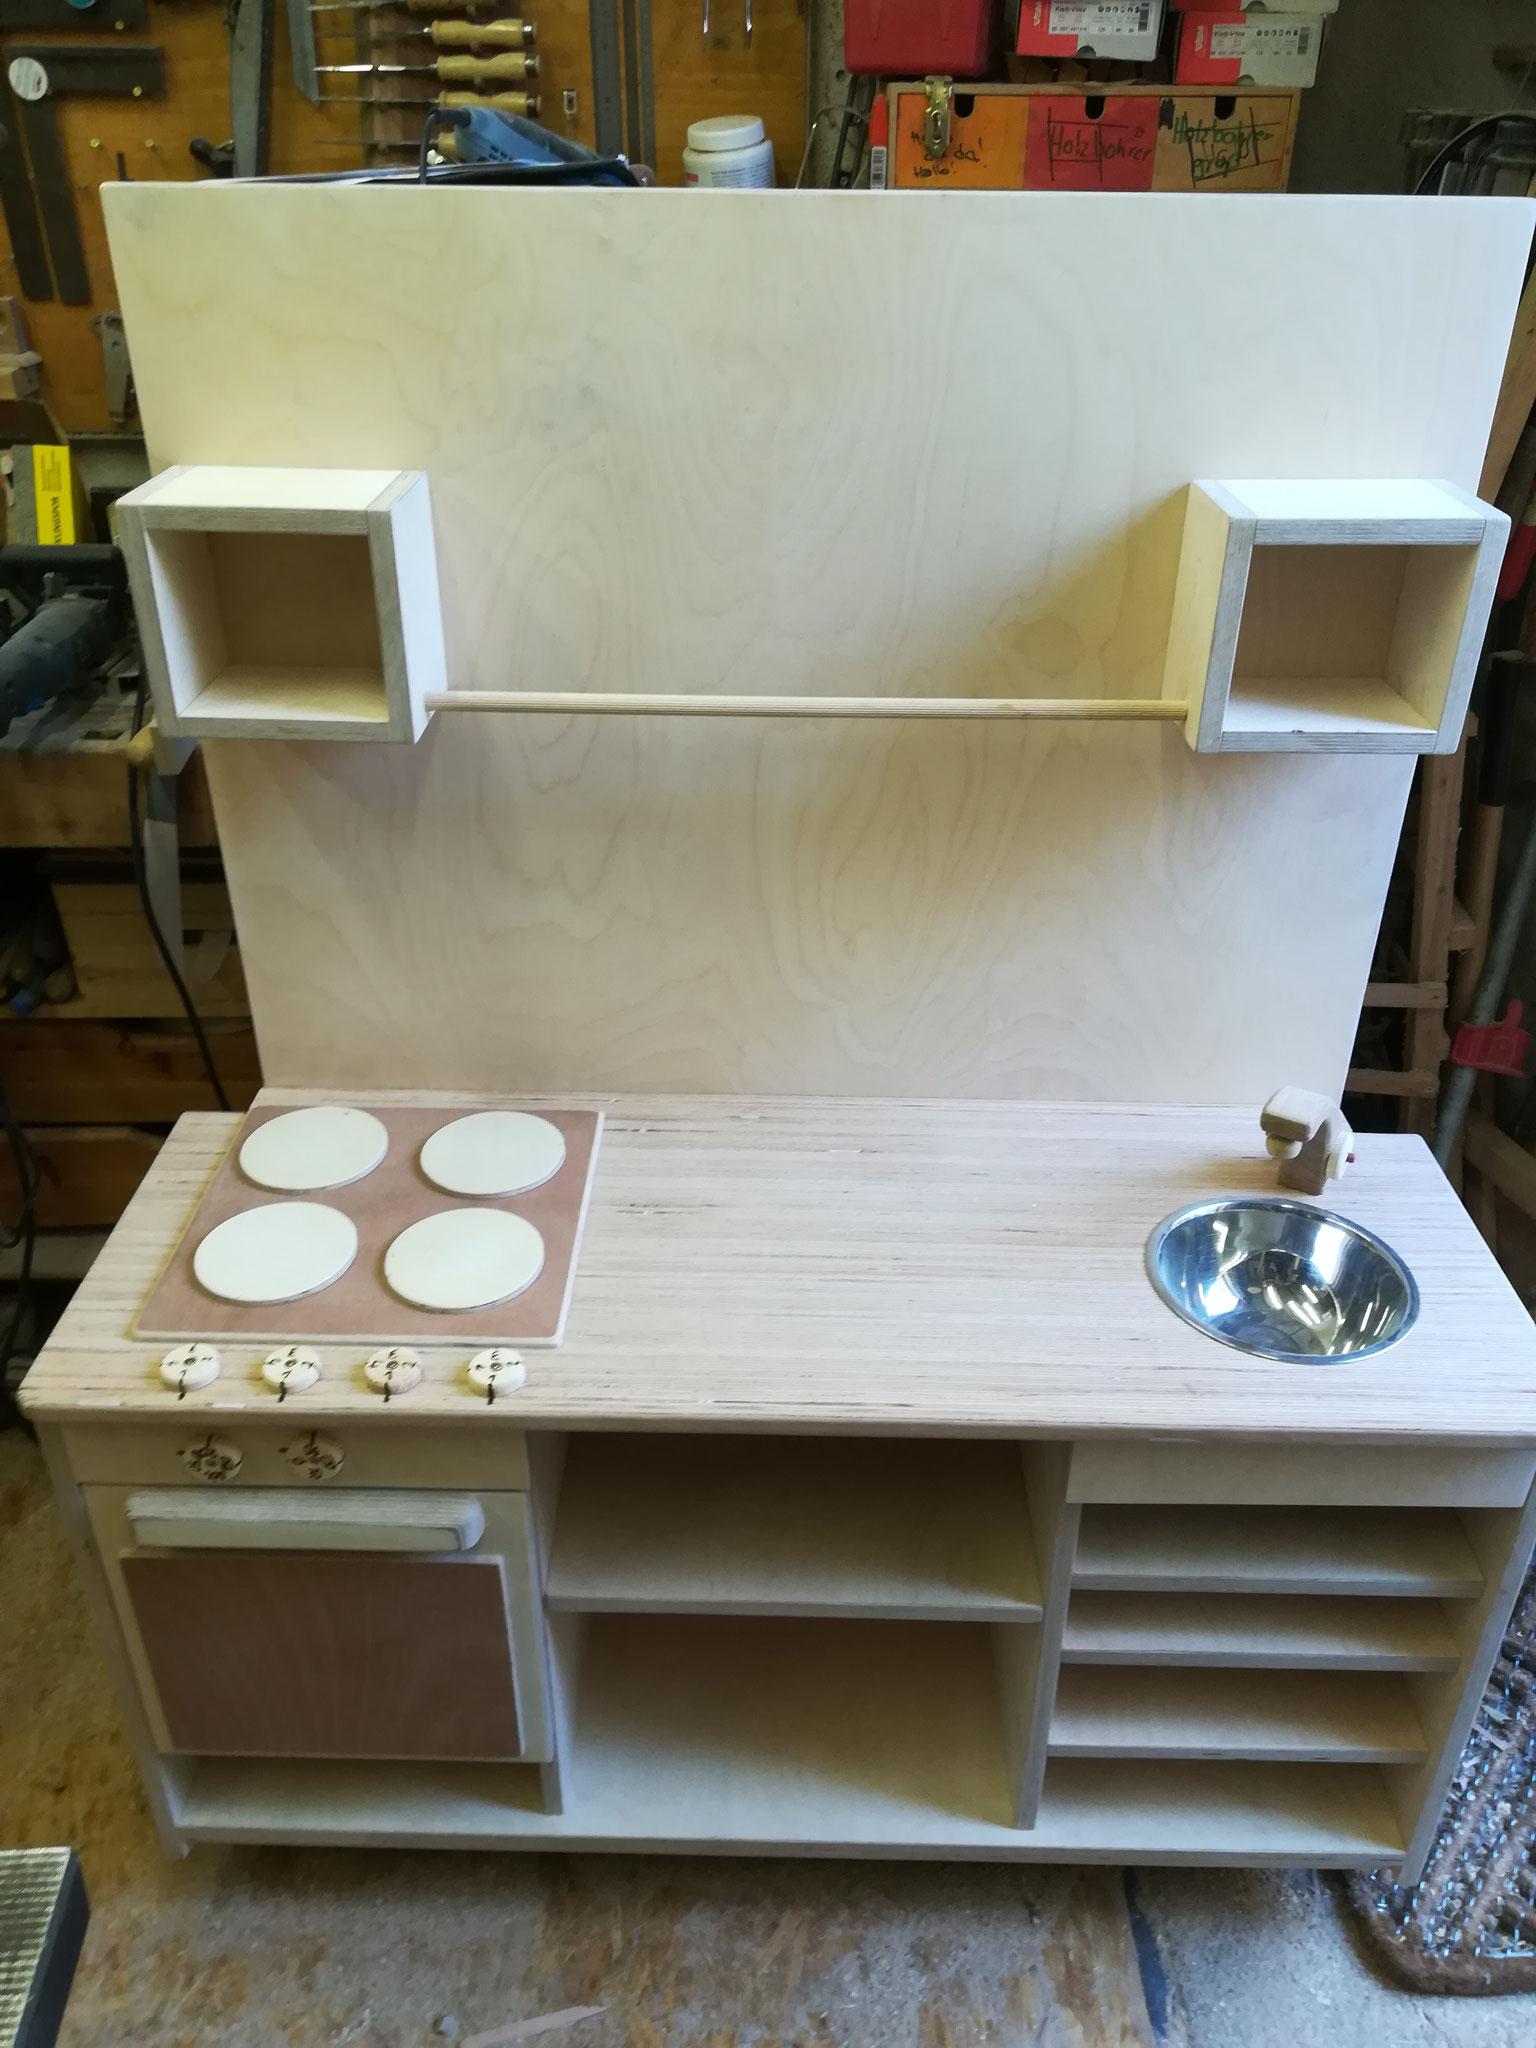 Küche mit Rückwand